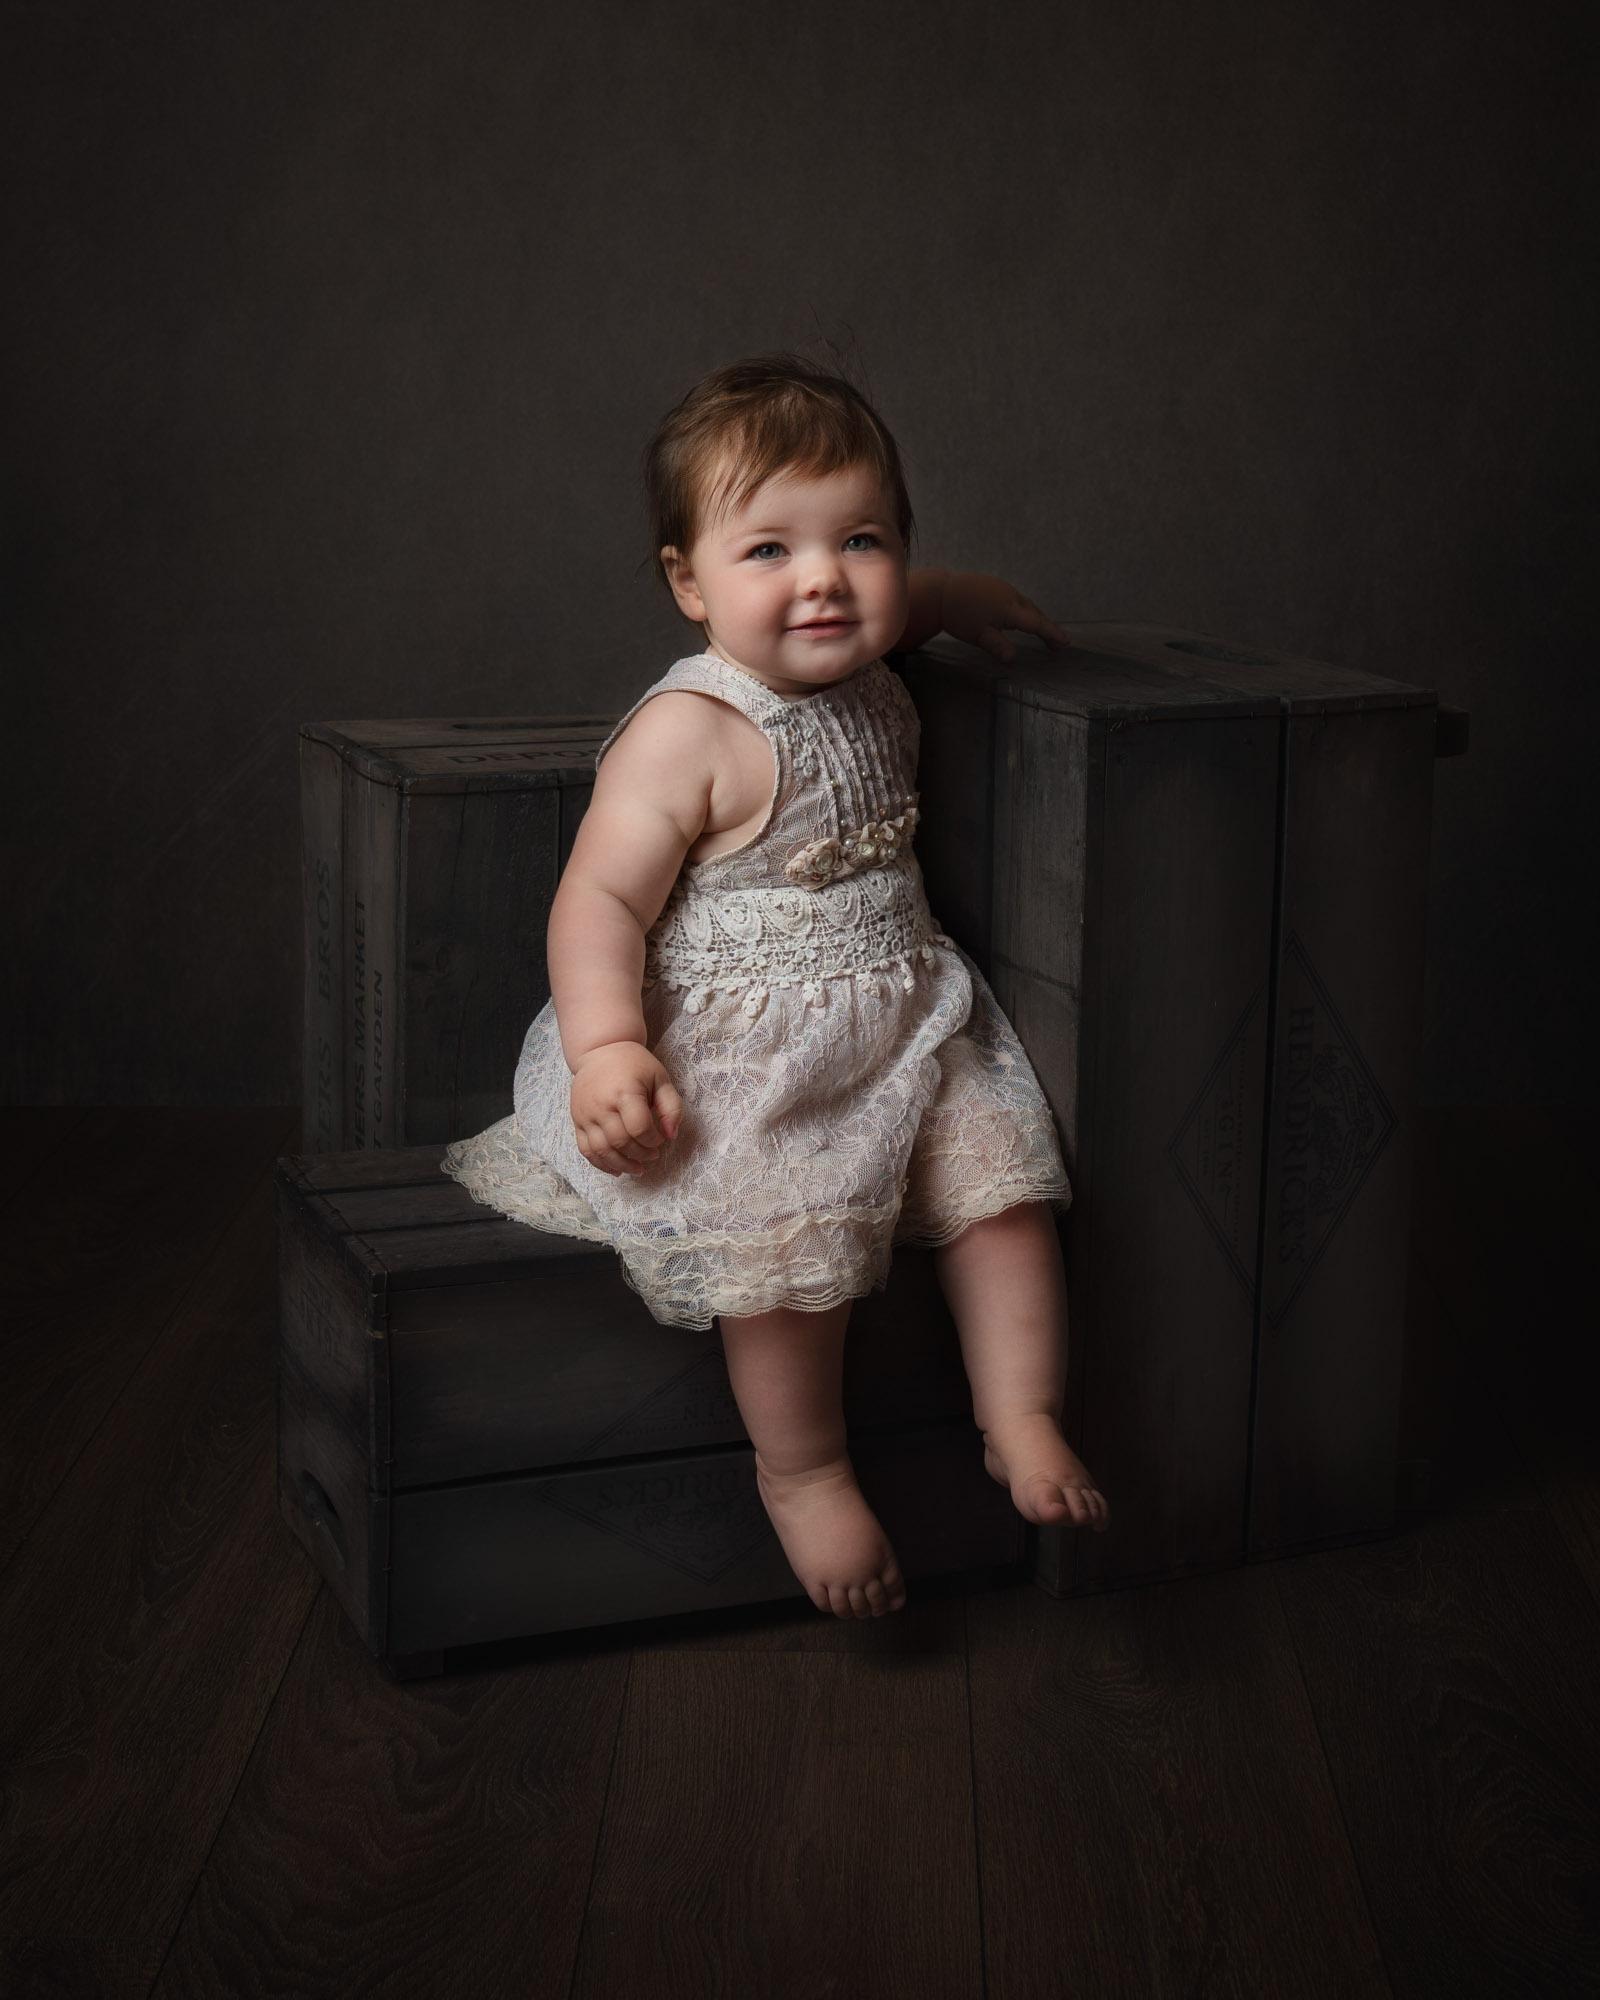 lisa-scott-photography-92